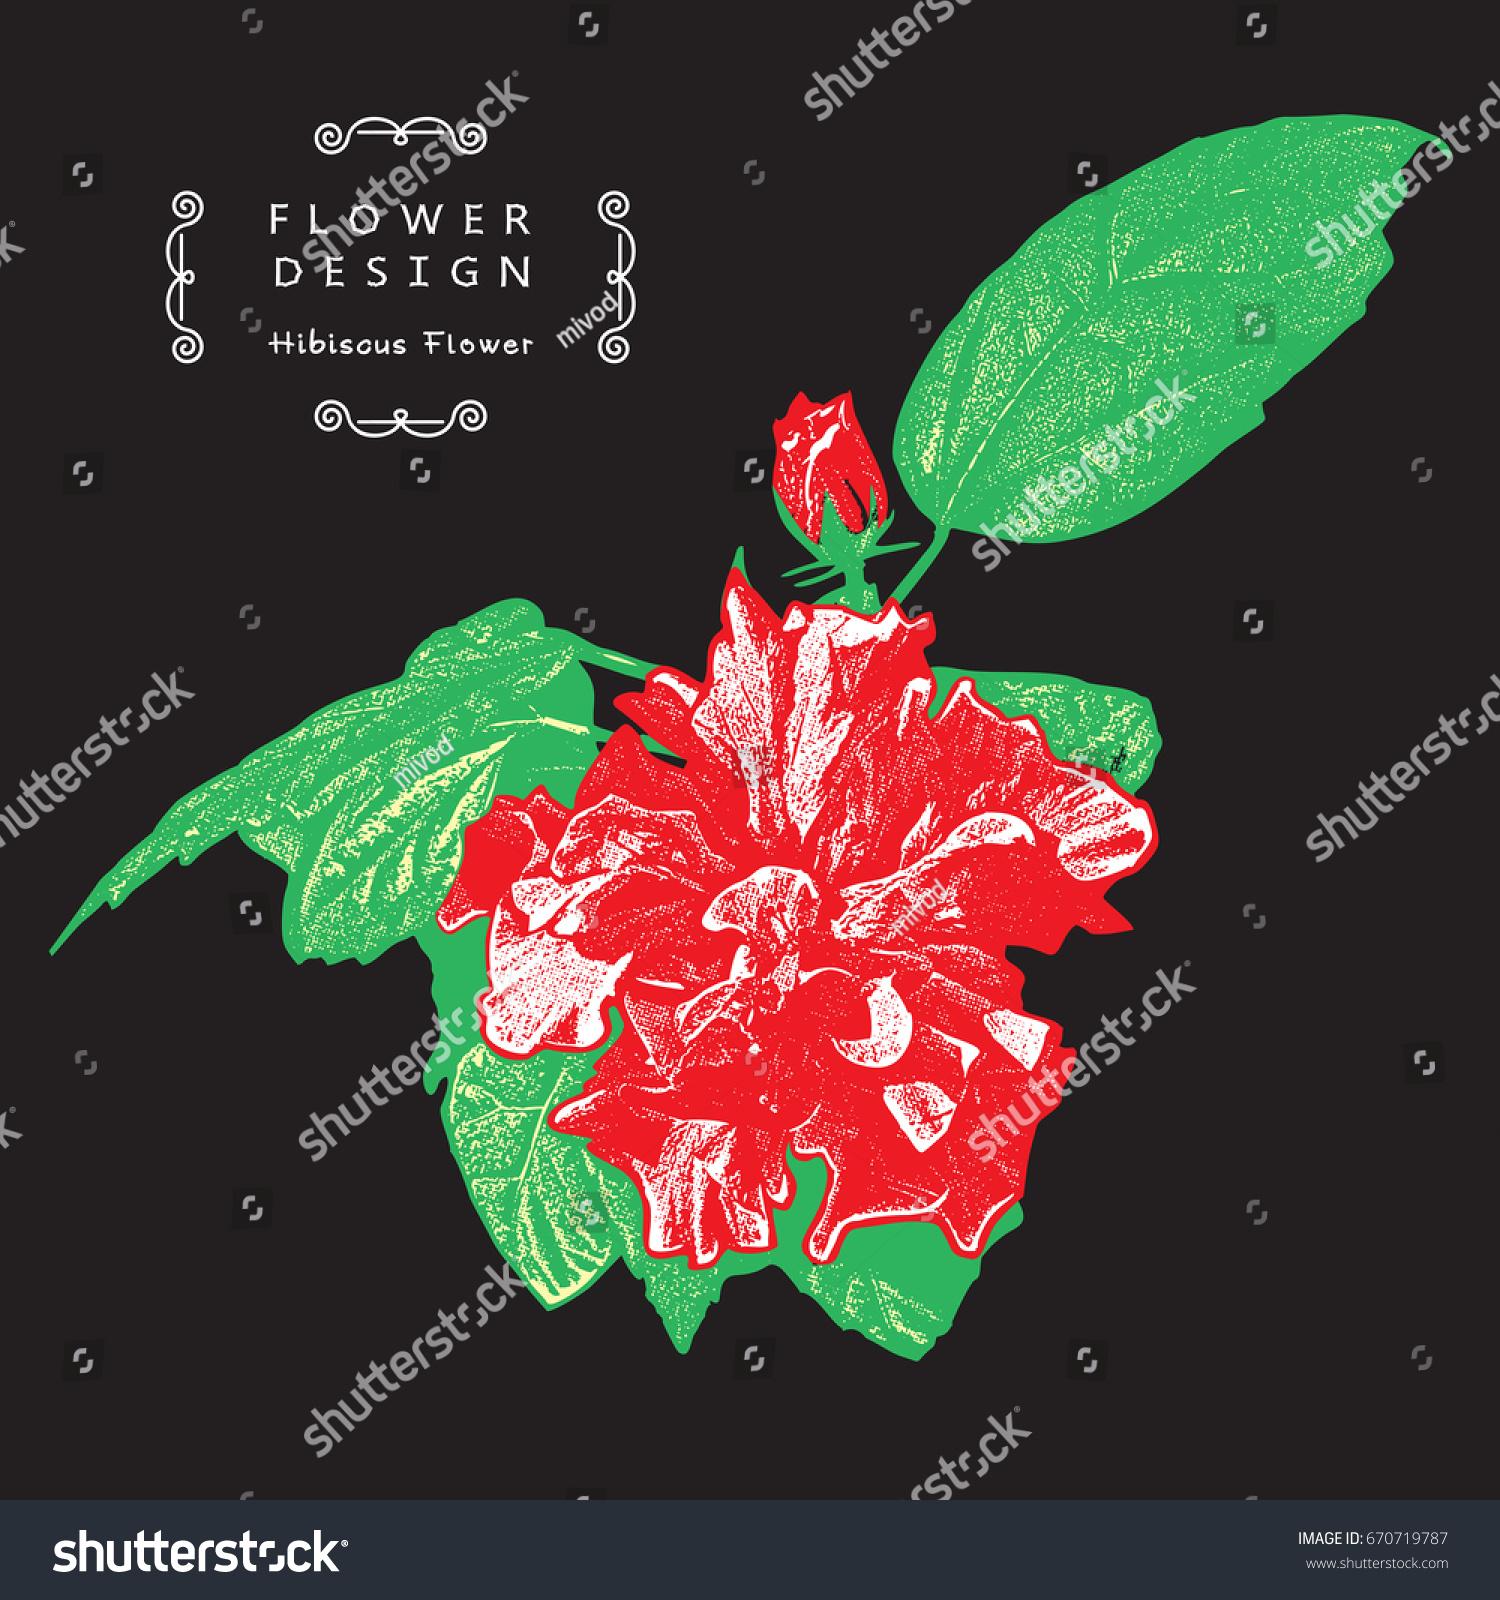 Beautiful flower china rose rosasinensis hawaiian stock vector beautiful flower china rose rosa sinensis hawaiian hibiscus vector illustration of izmirmasajfo